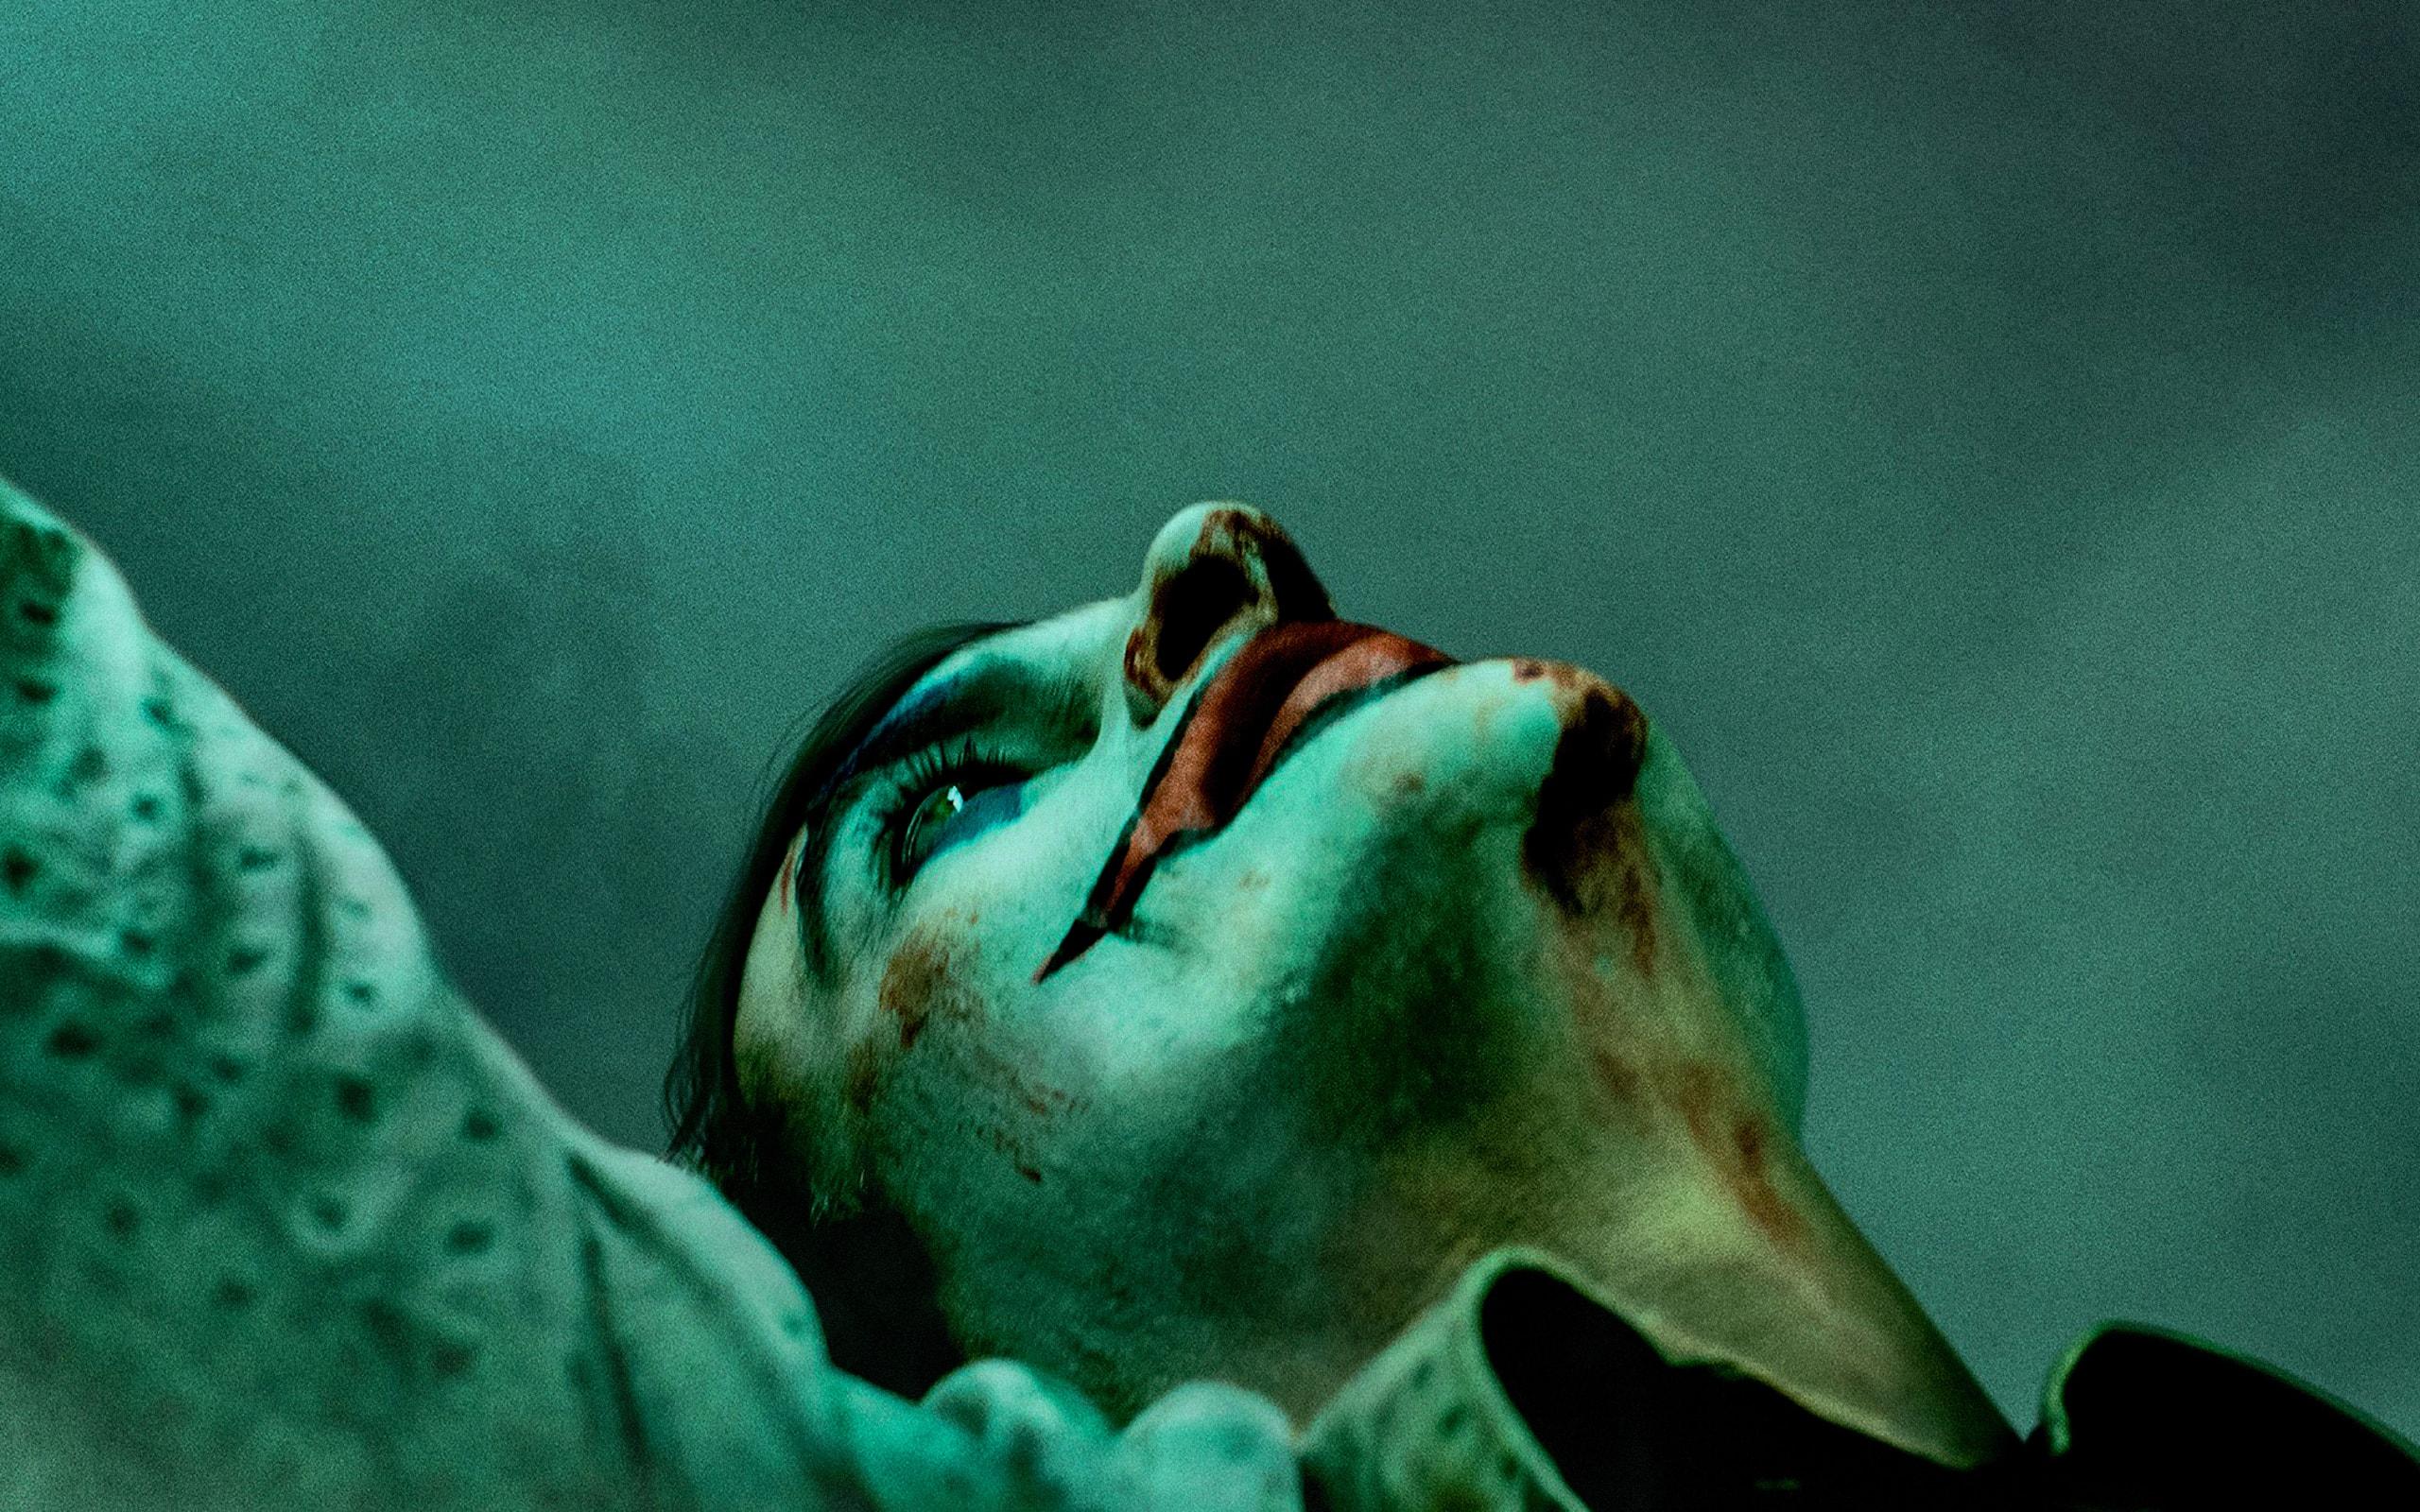 Wallpaper of Joaquin Phoenix Joker Joker 2019 Poster background 2560x1600